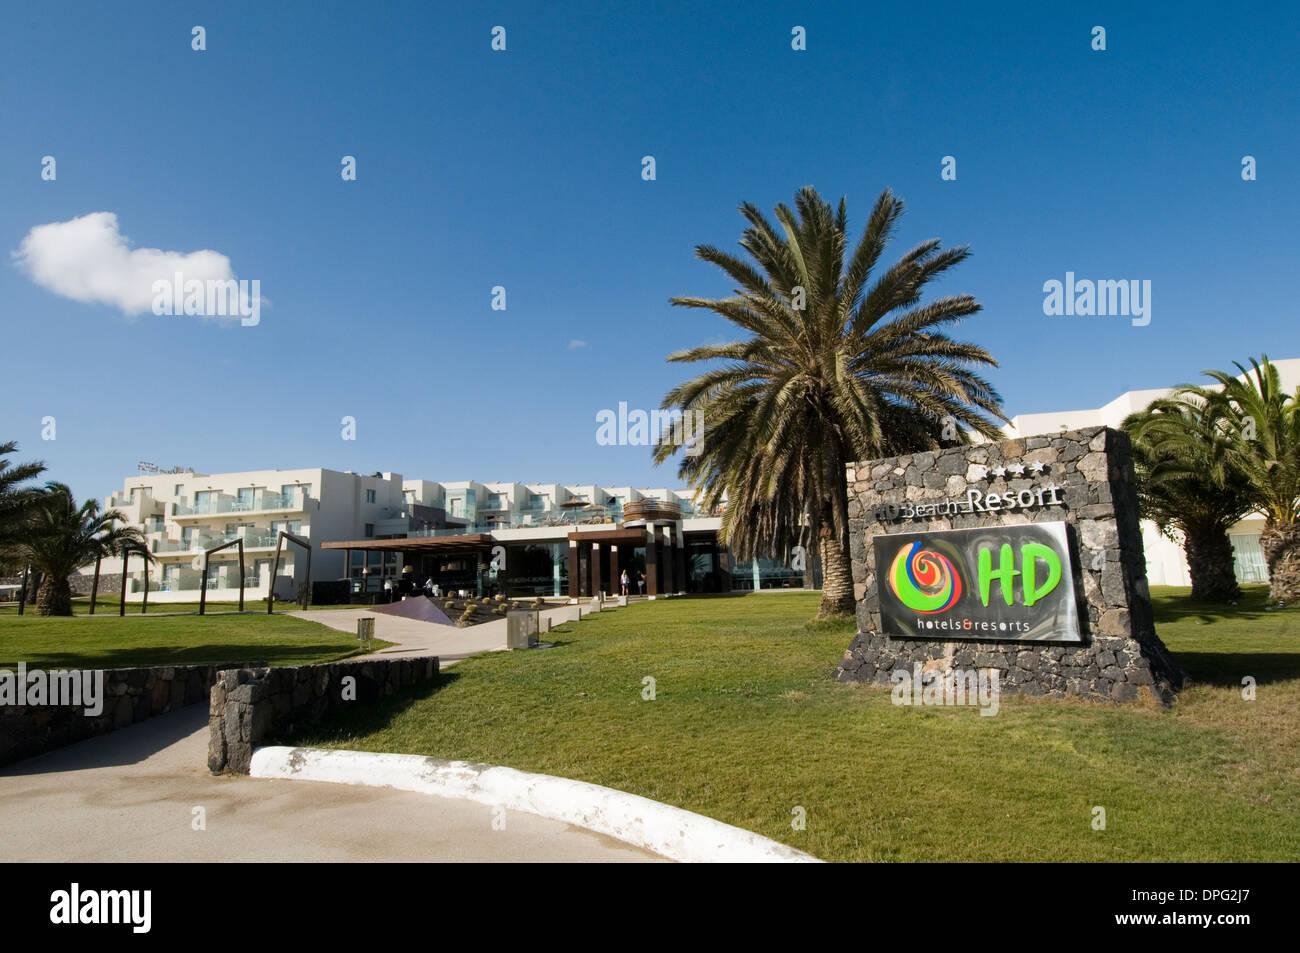 Hd stockfotos hd bilder alamy for Designhotel am strand